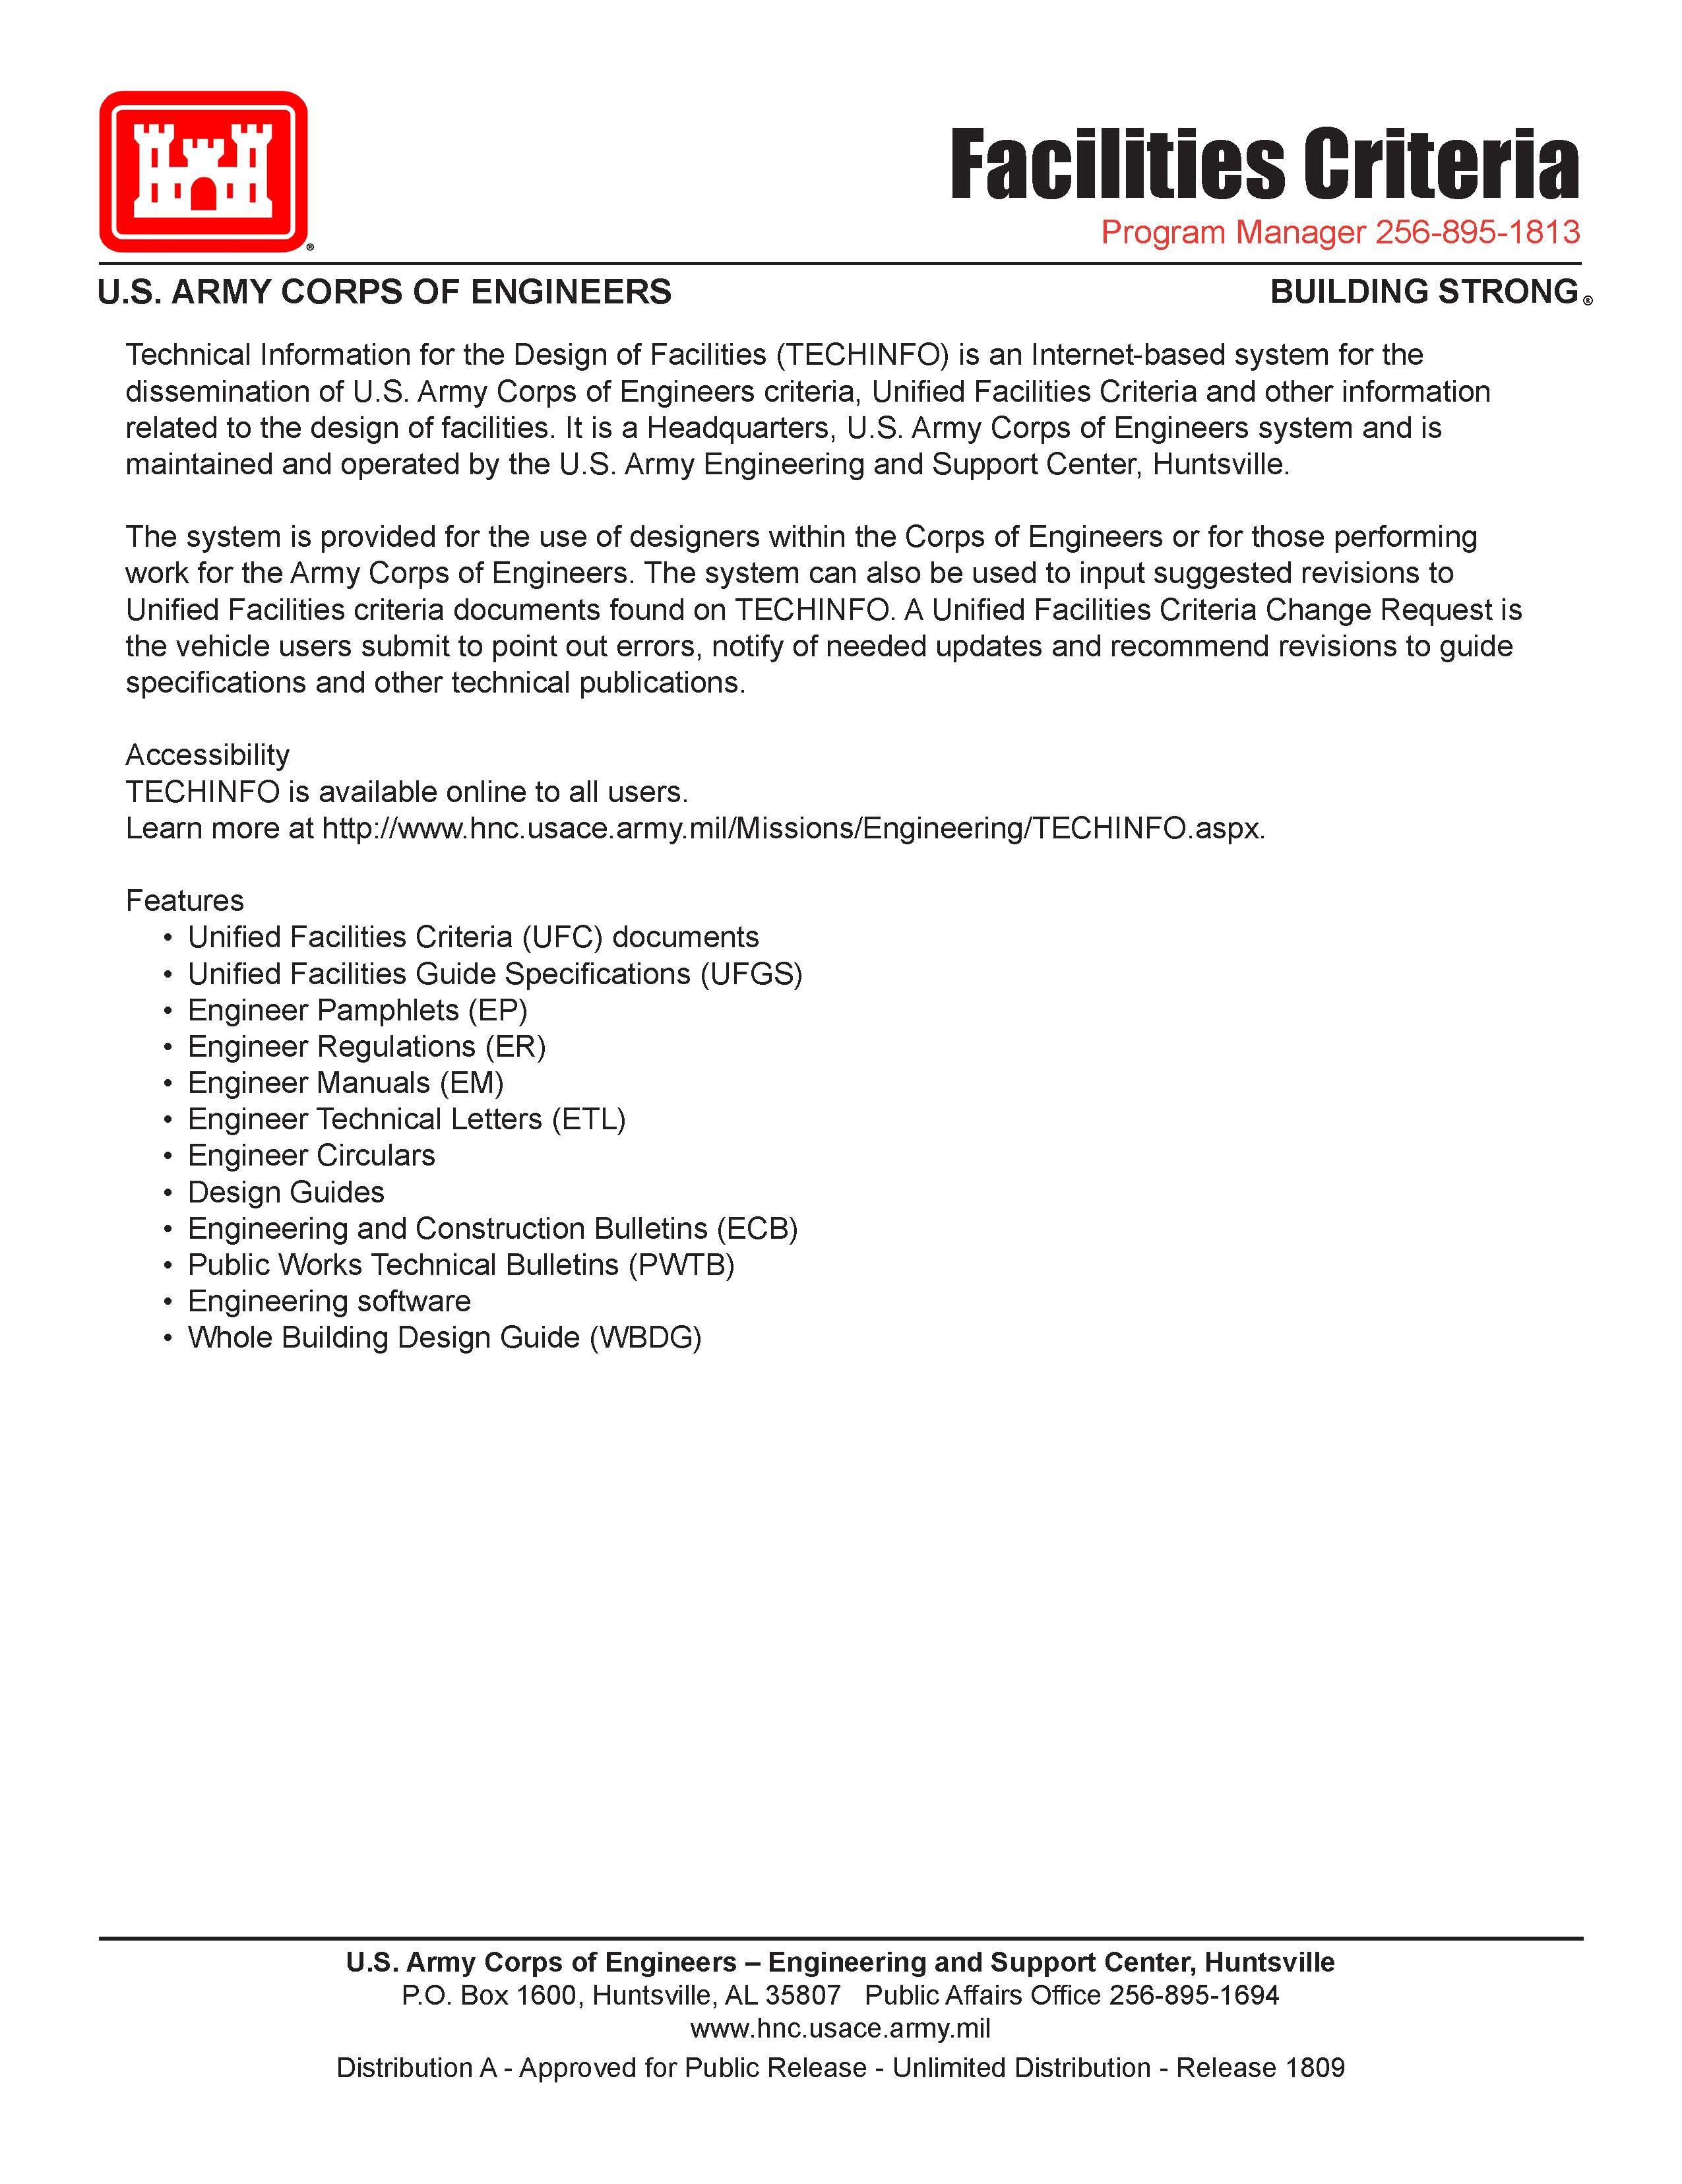 Download the Facilities Criteria Fact Sheet (PDF)